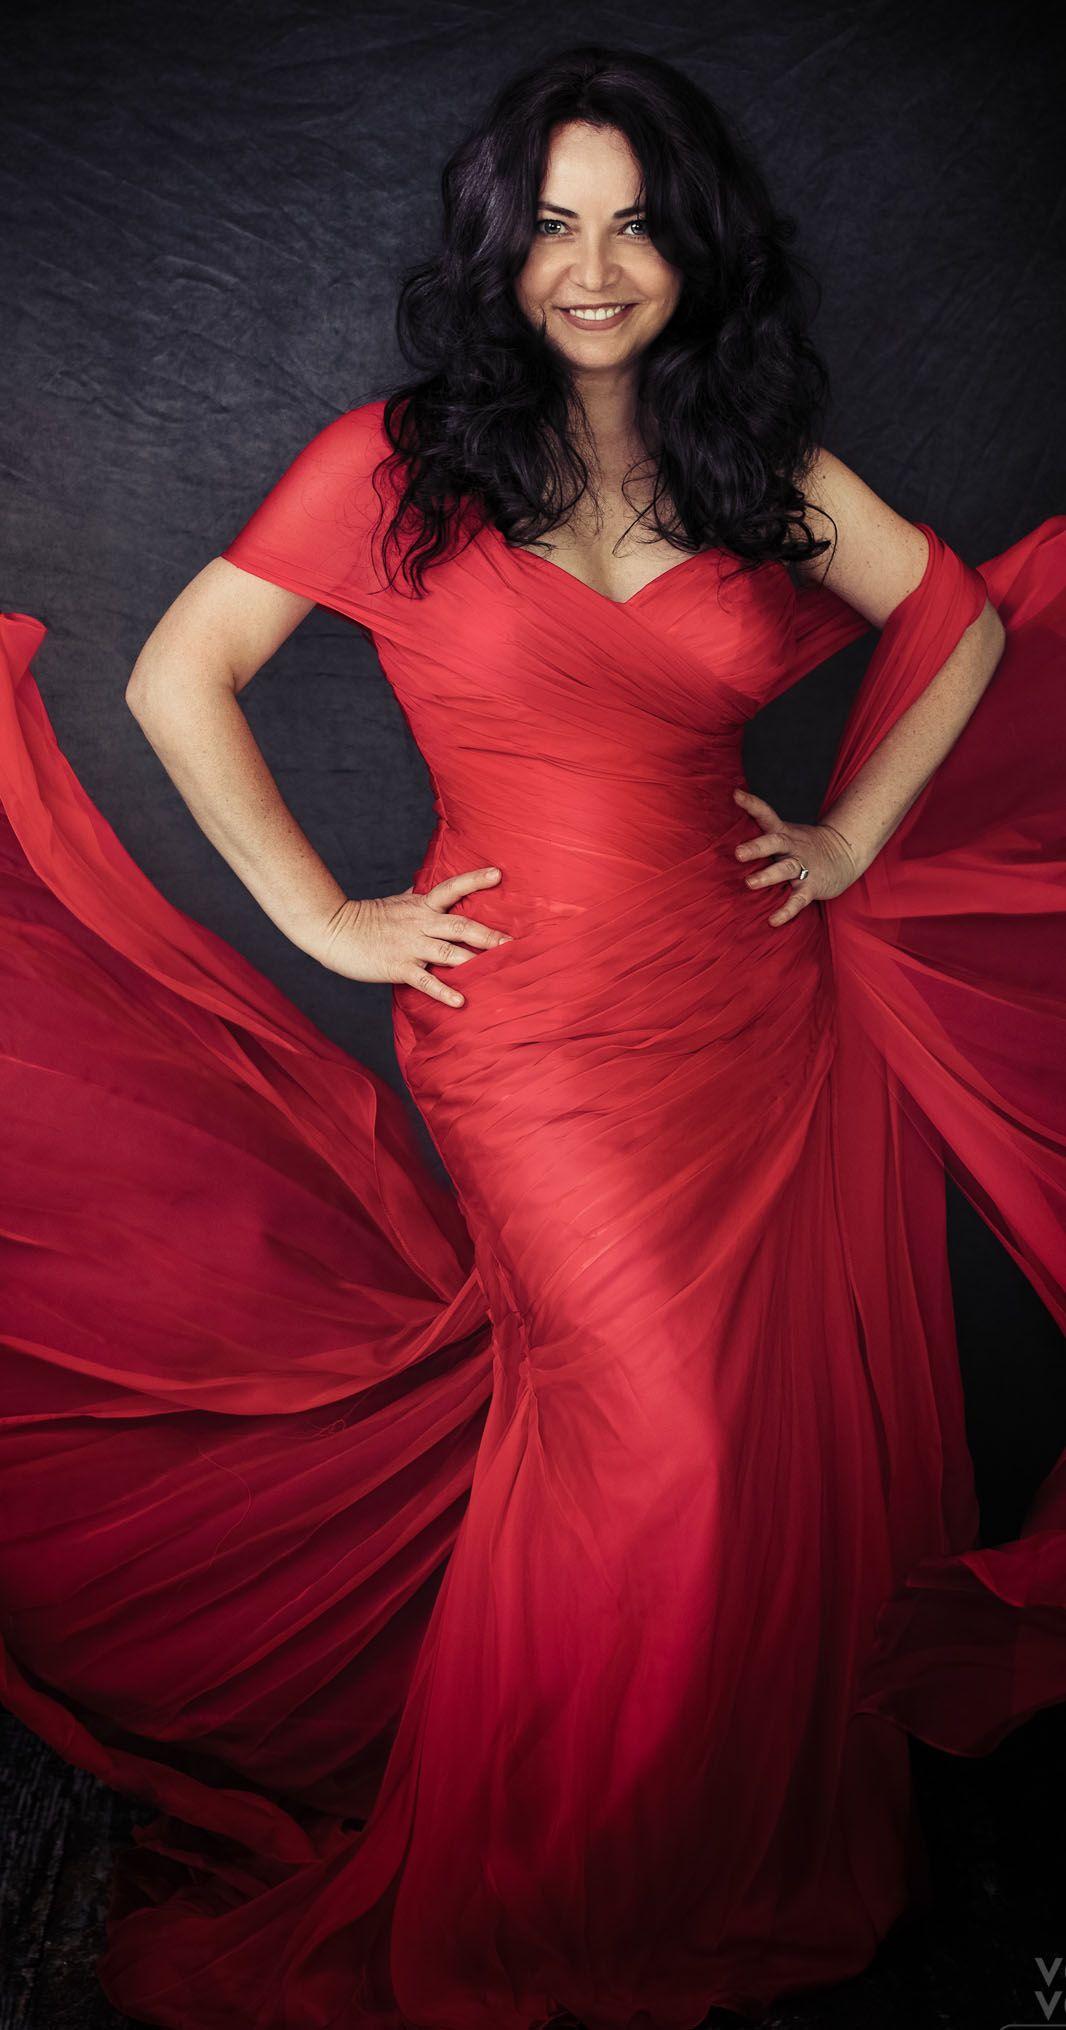 Cap sleeve vneck red evening formal dress dress